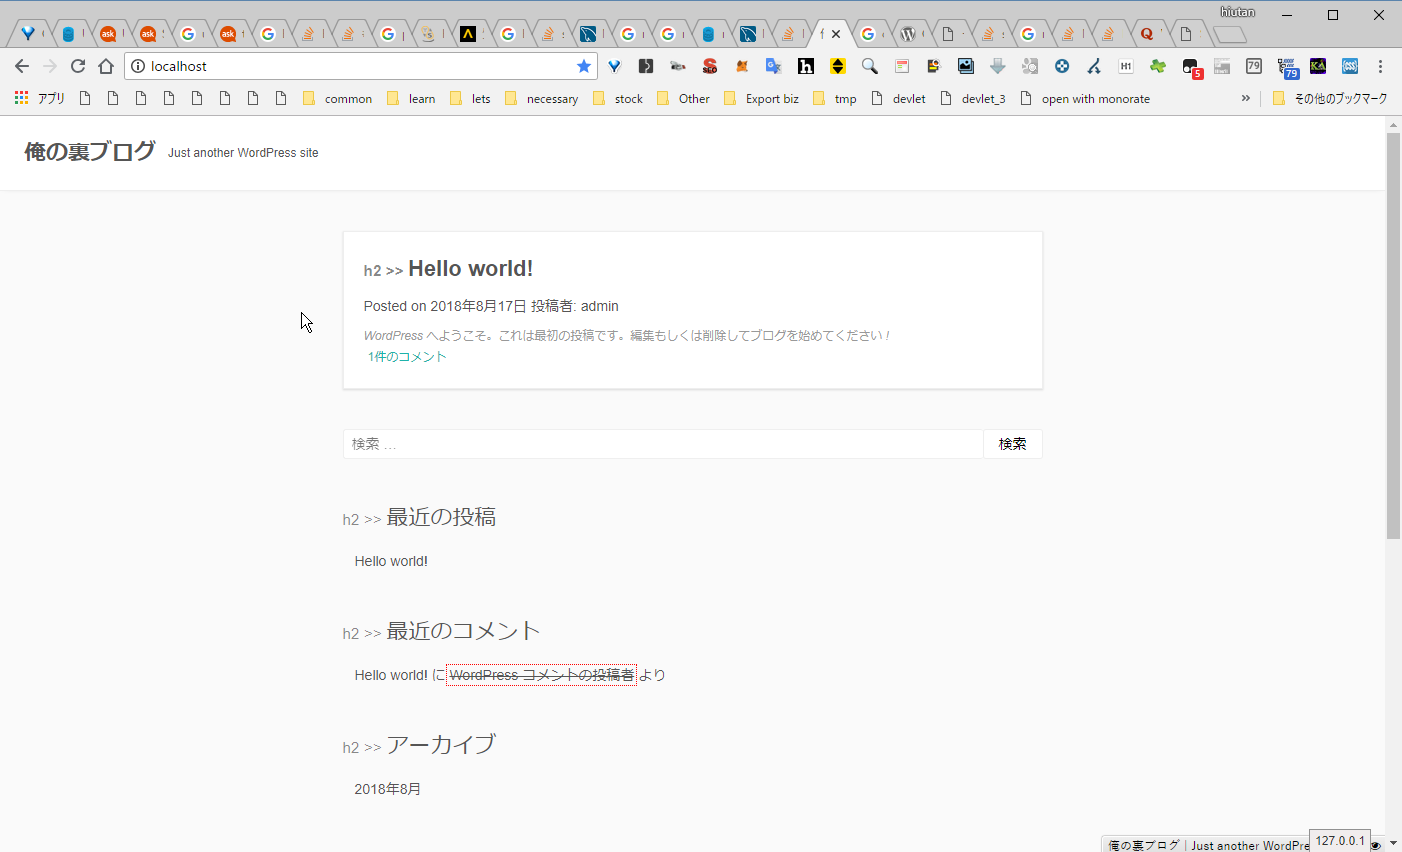 https://yuis.xsrv.jp/images/ss/ShareX_ScreenShot_e513edb8-6d98-4bbb-bbff-6ebd0e042e08.png